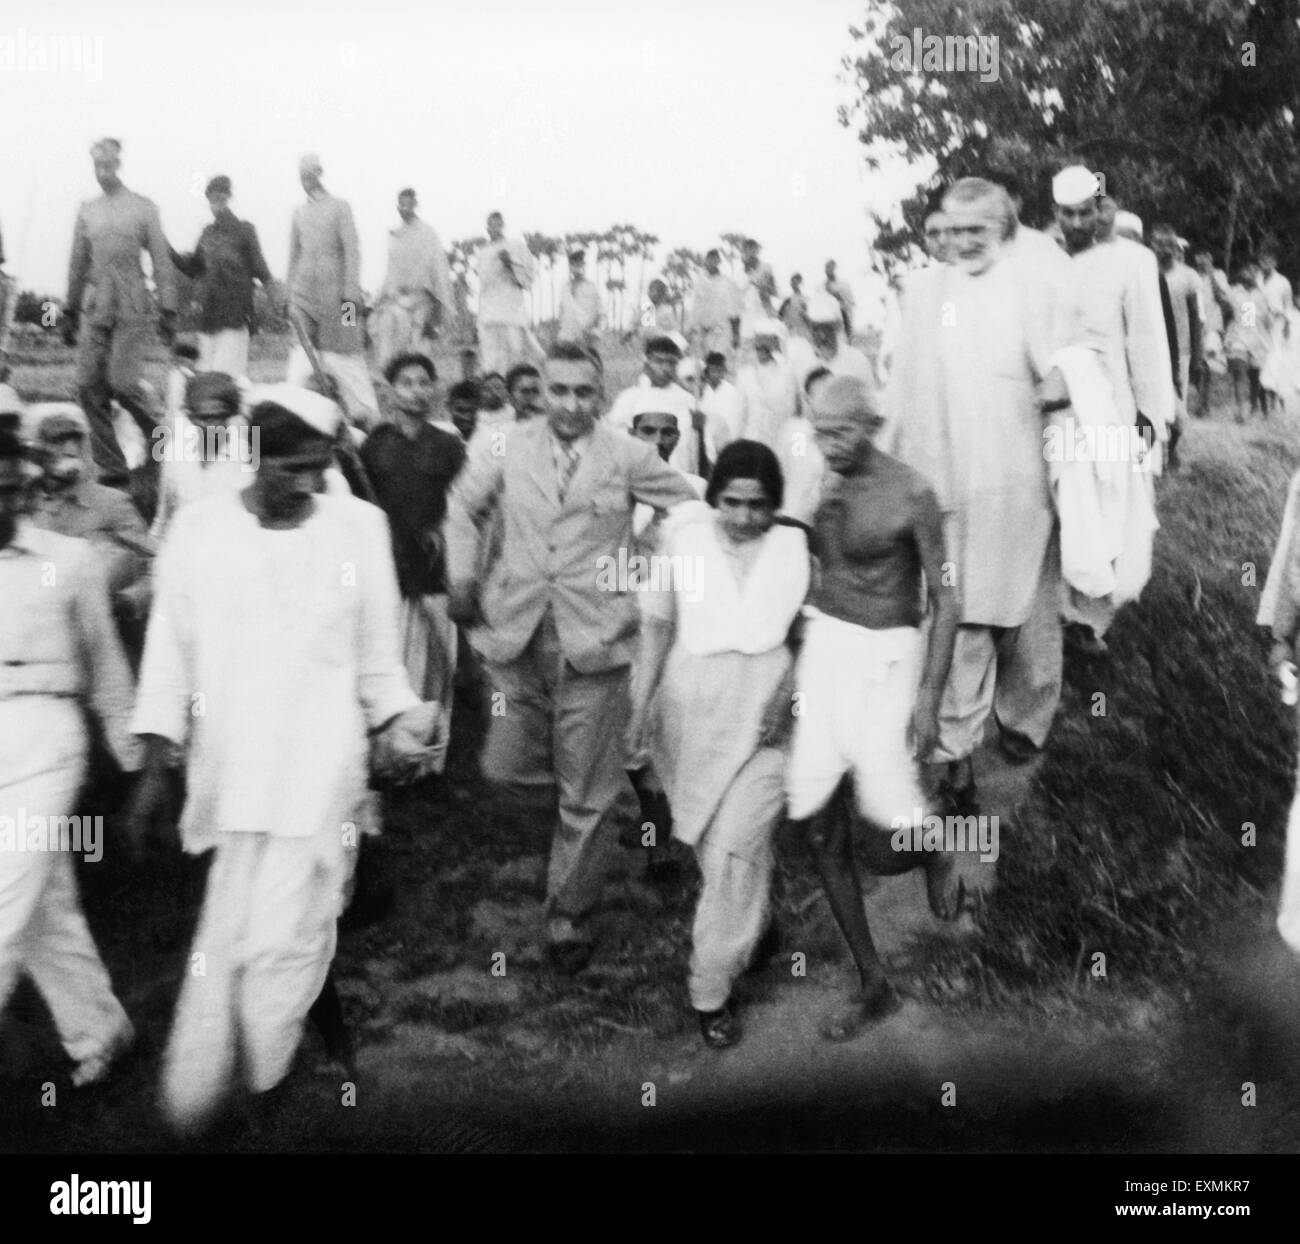 Mahatma Gandhi and others on his march through the riot stricken areas of Bihar ; 1947 ; Mridulabehn Sarabai - Stock Image